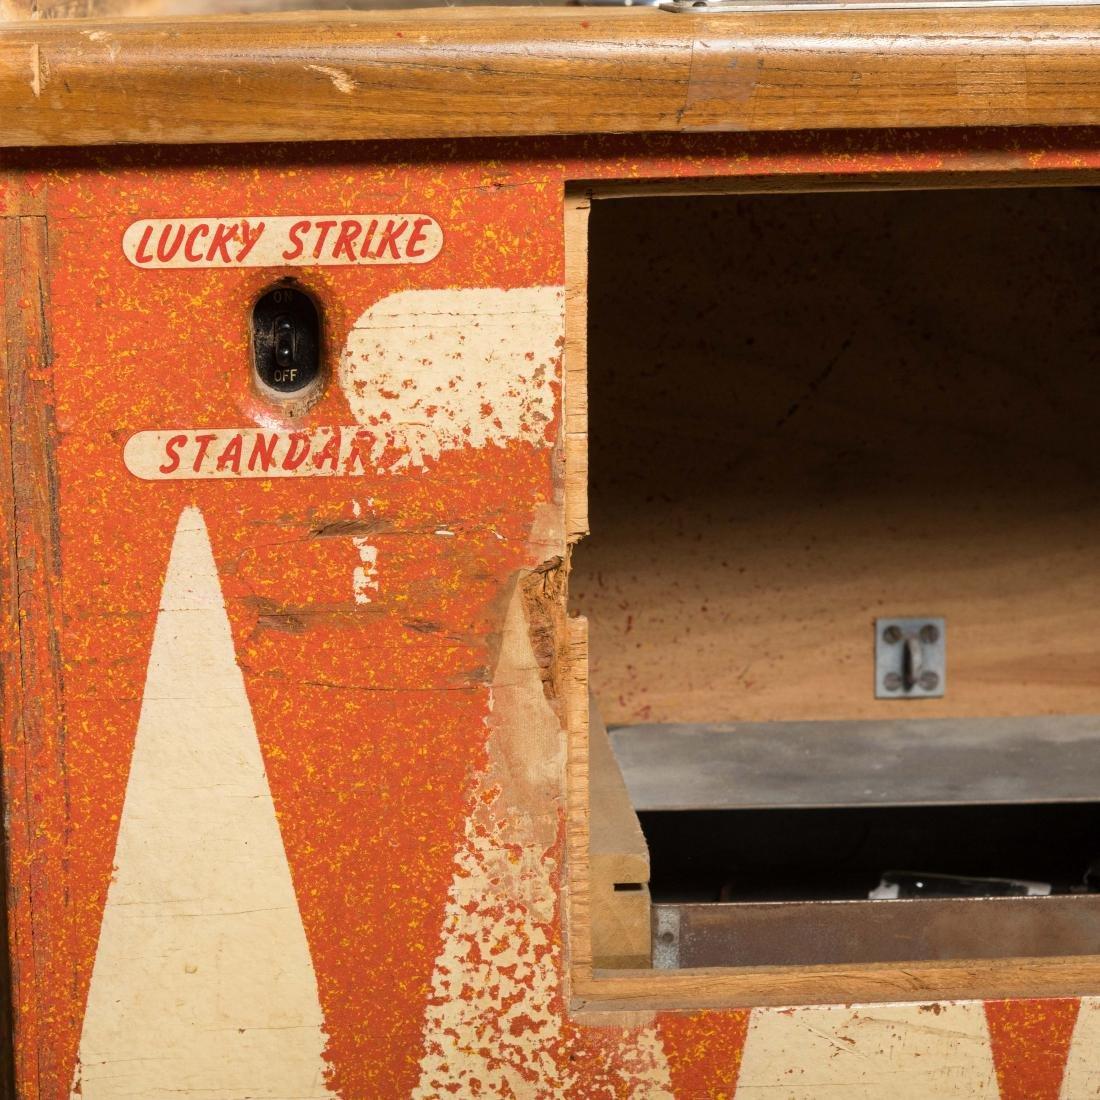 Bally Lucky Strike Bowling Machine - 6